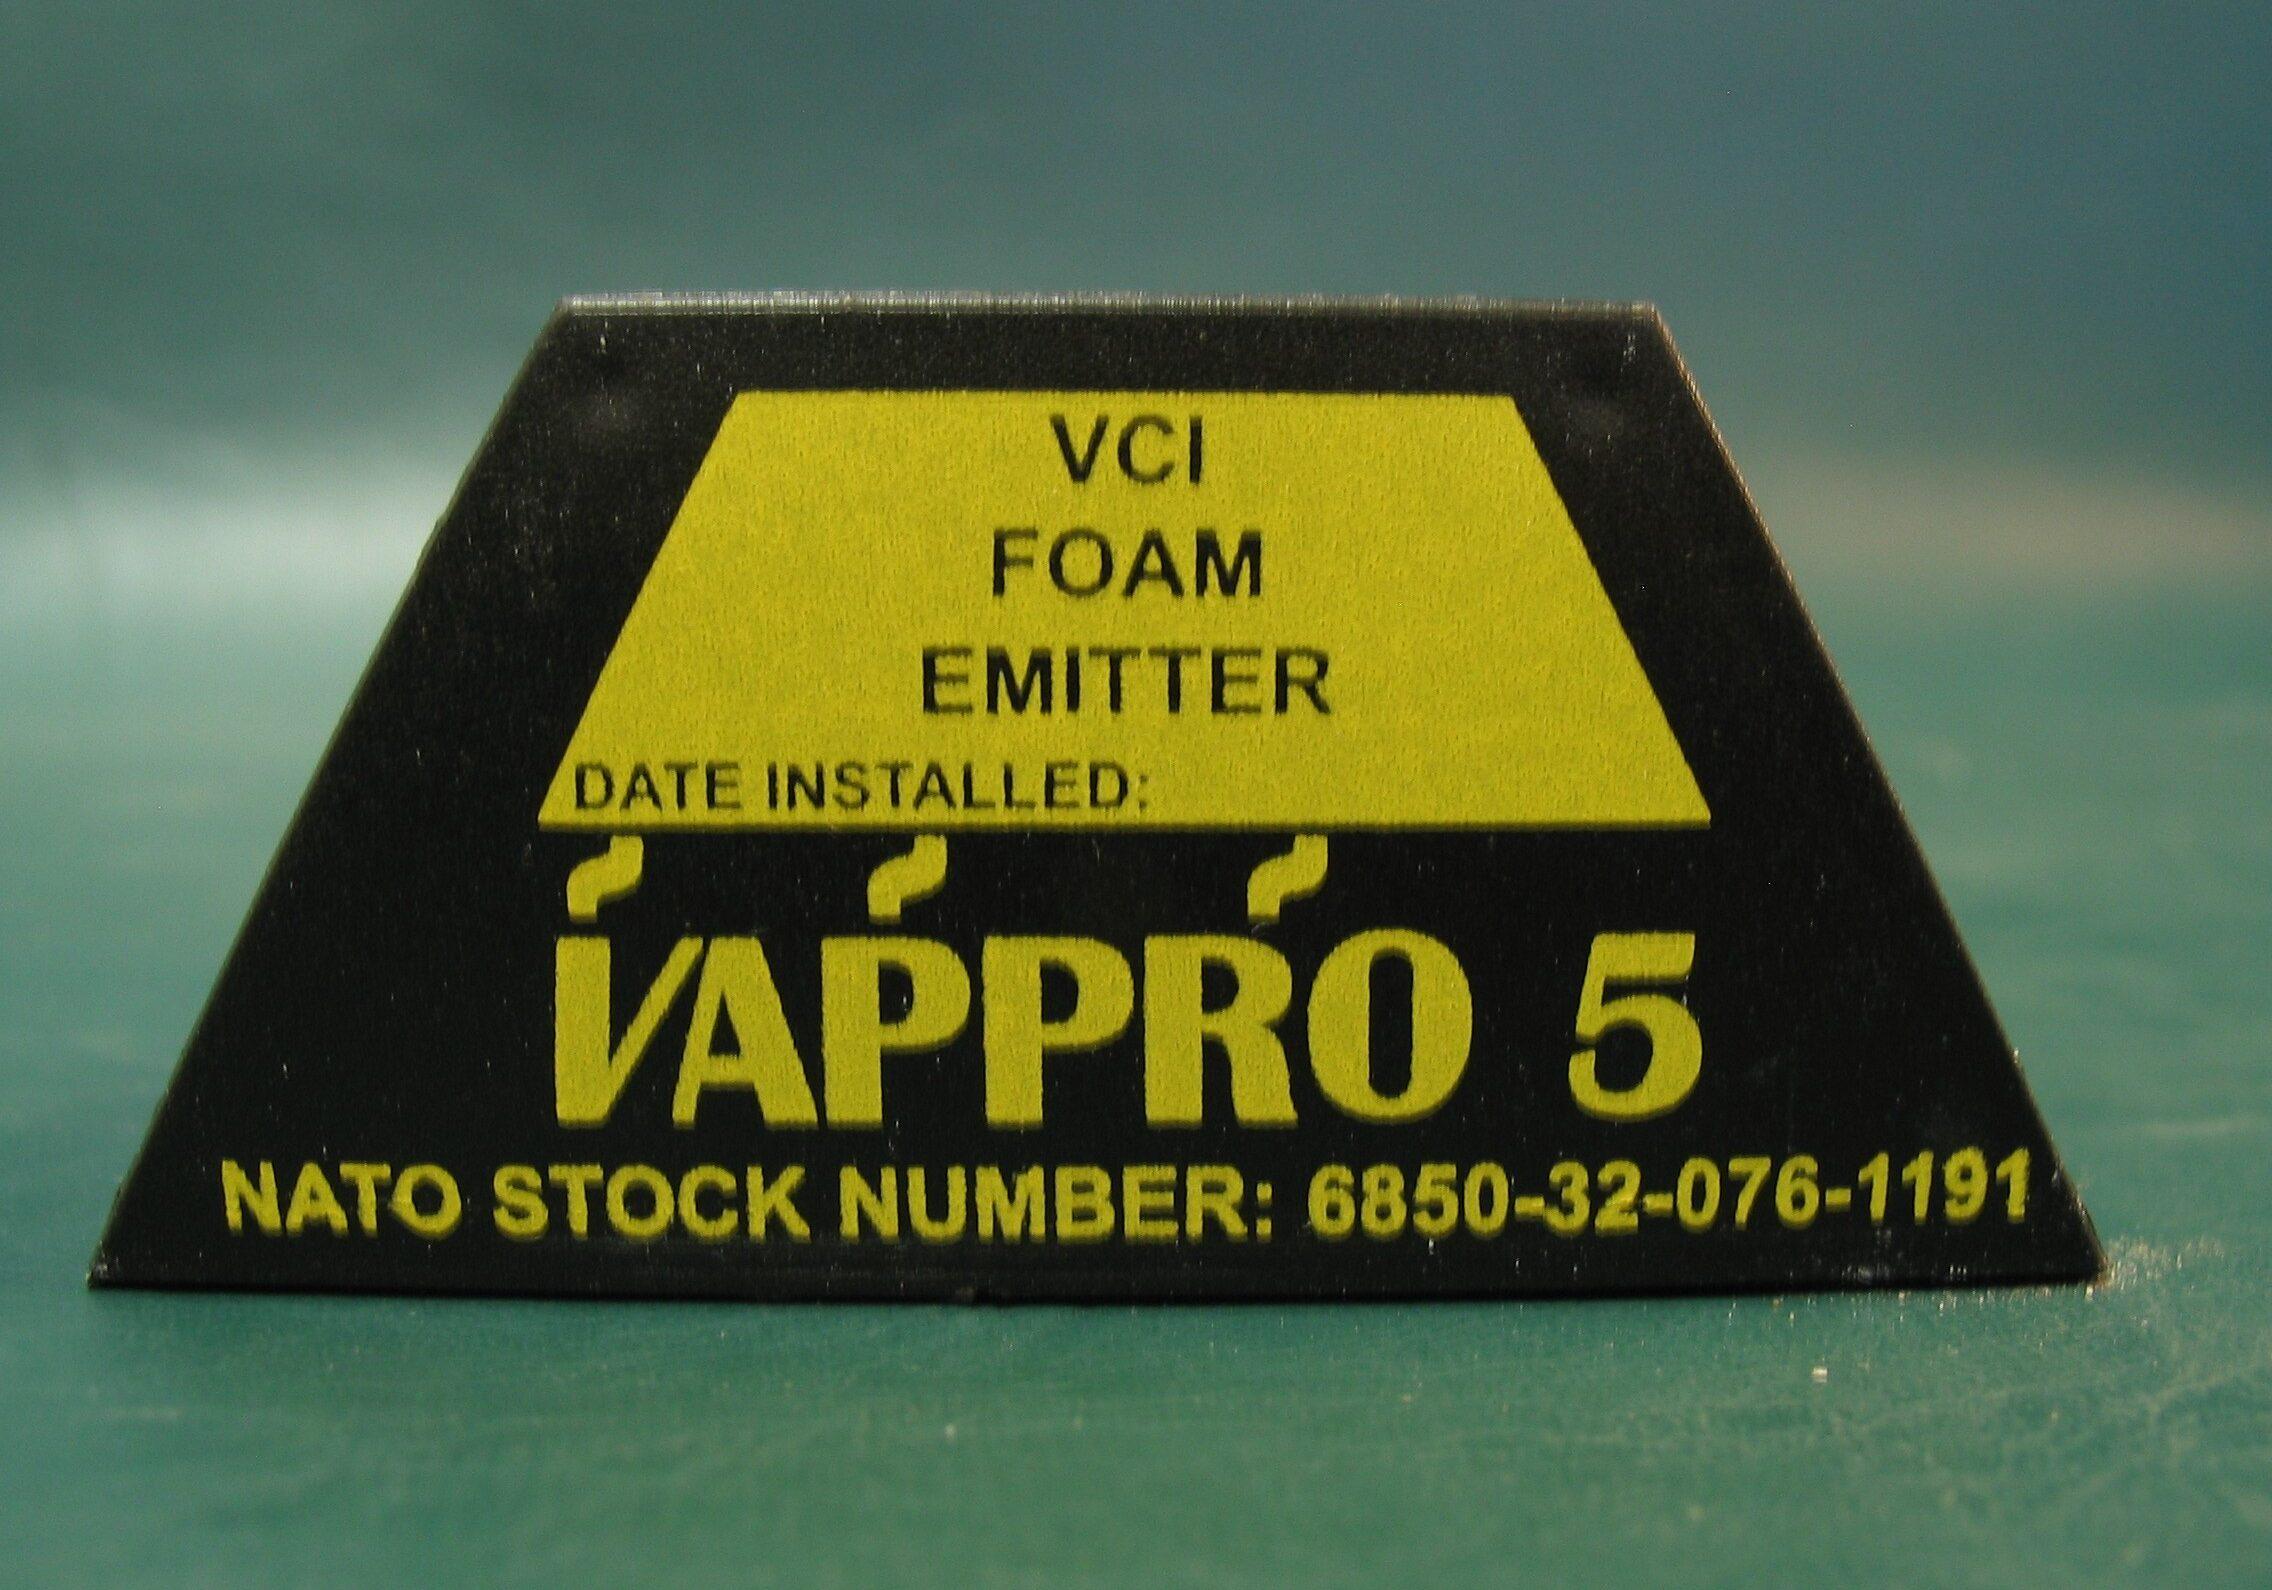 Vappro 5 VCI foam emitter